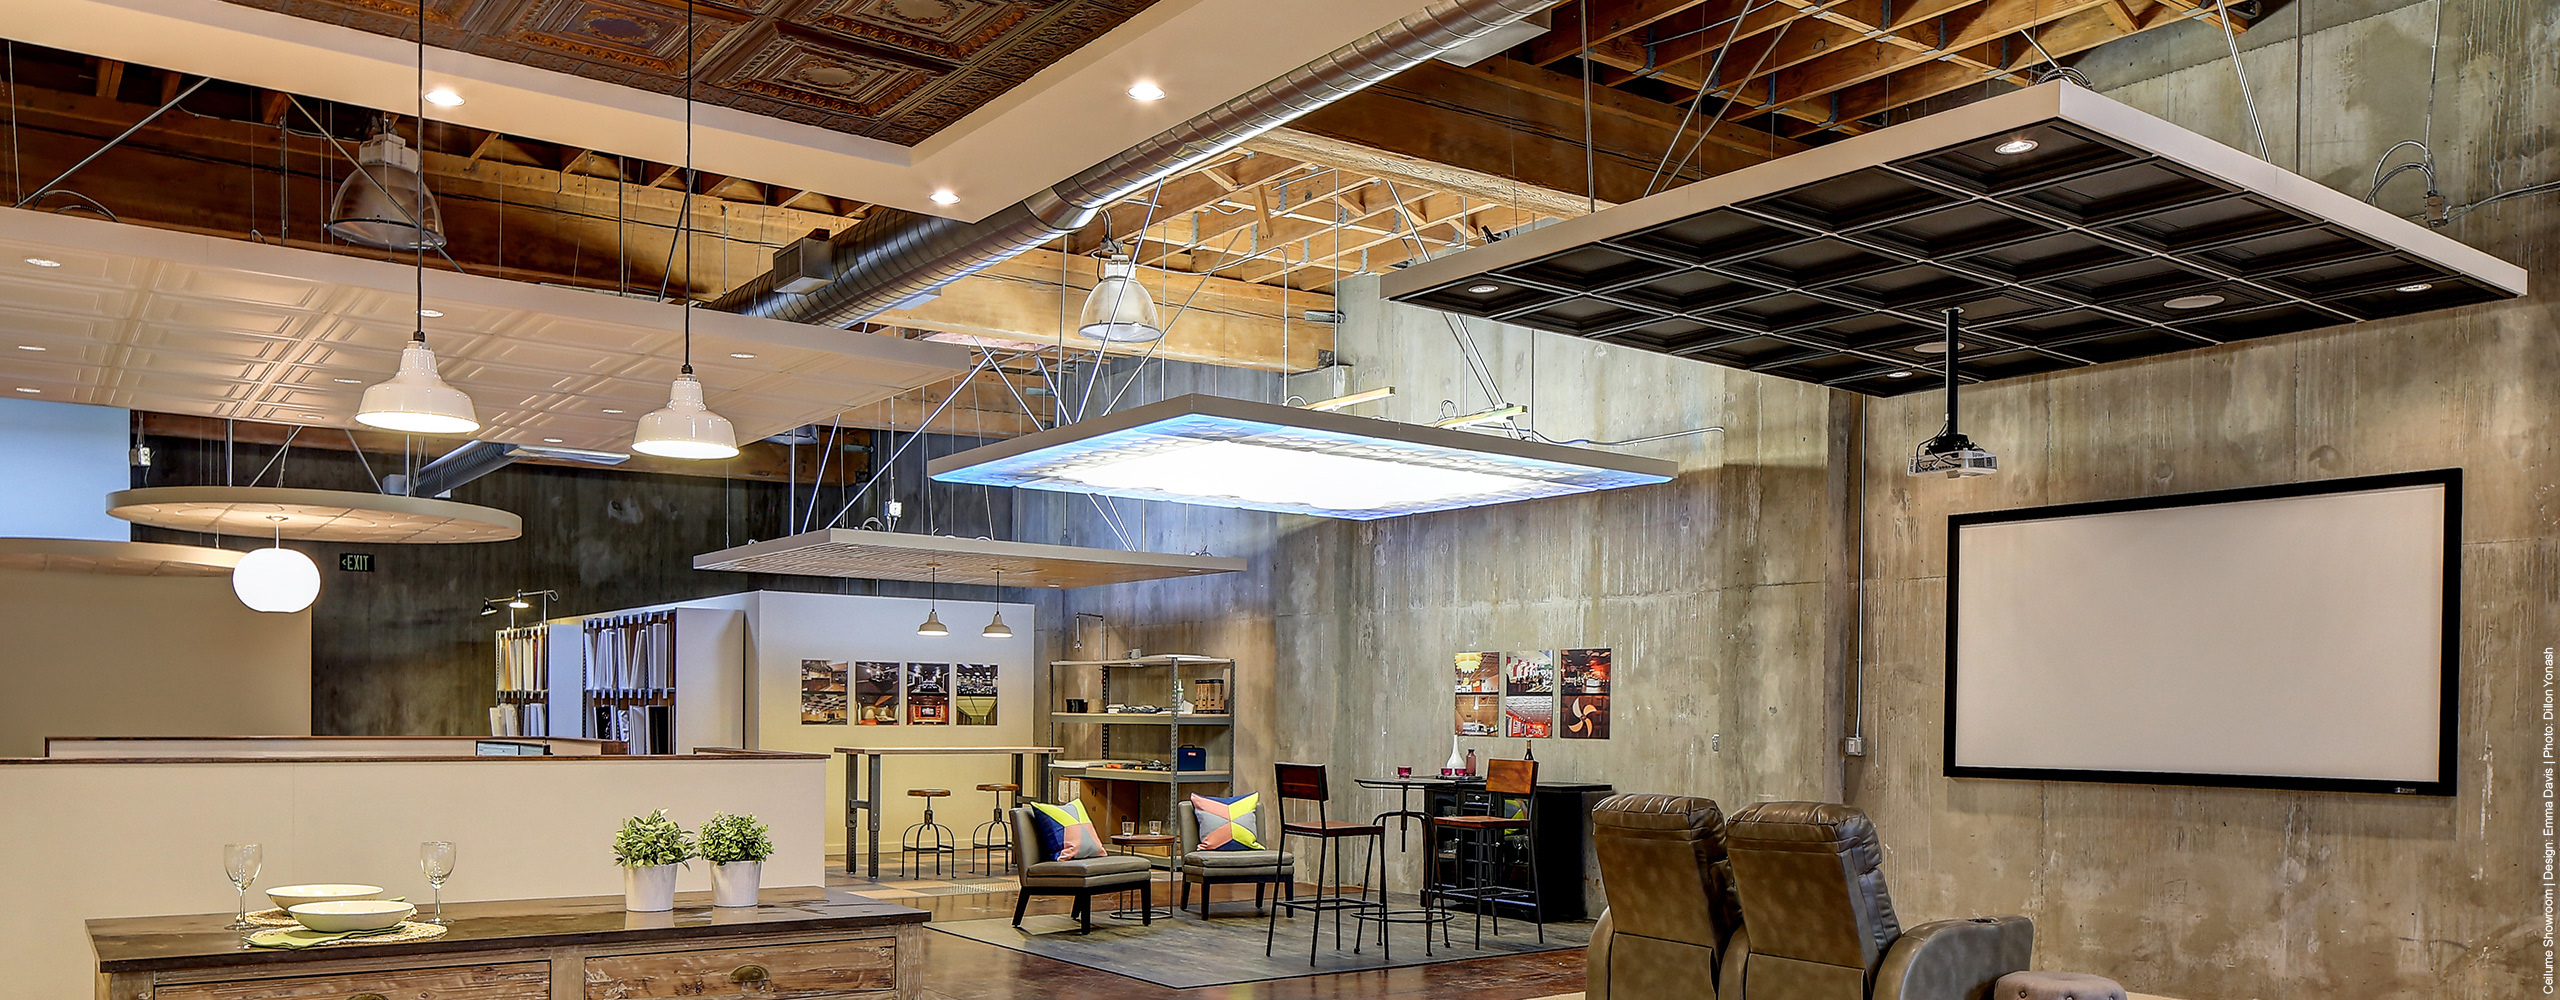 Commercial Ceilings Ceilume